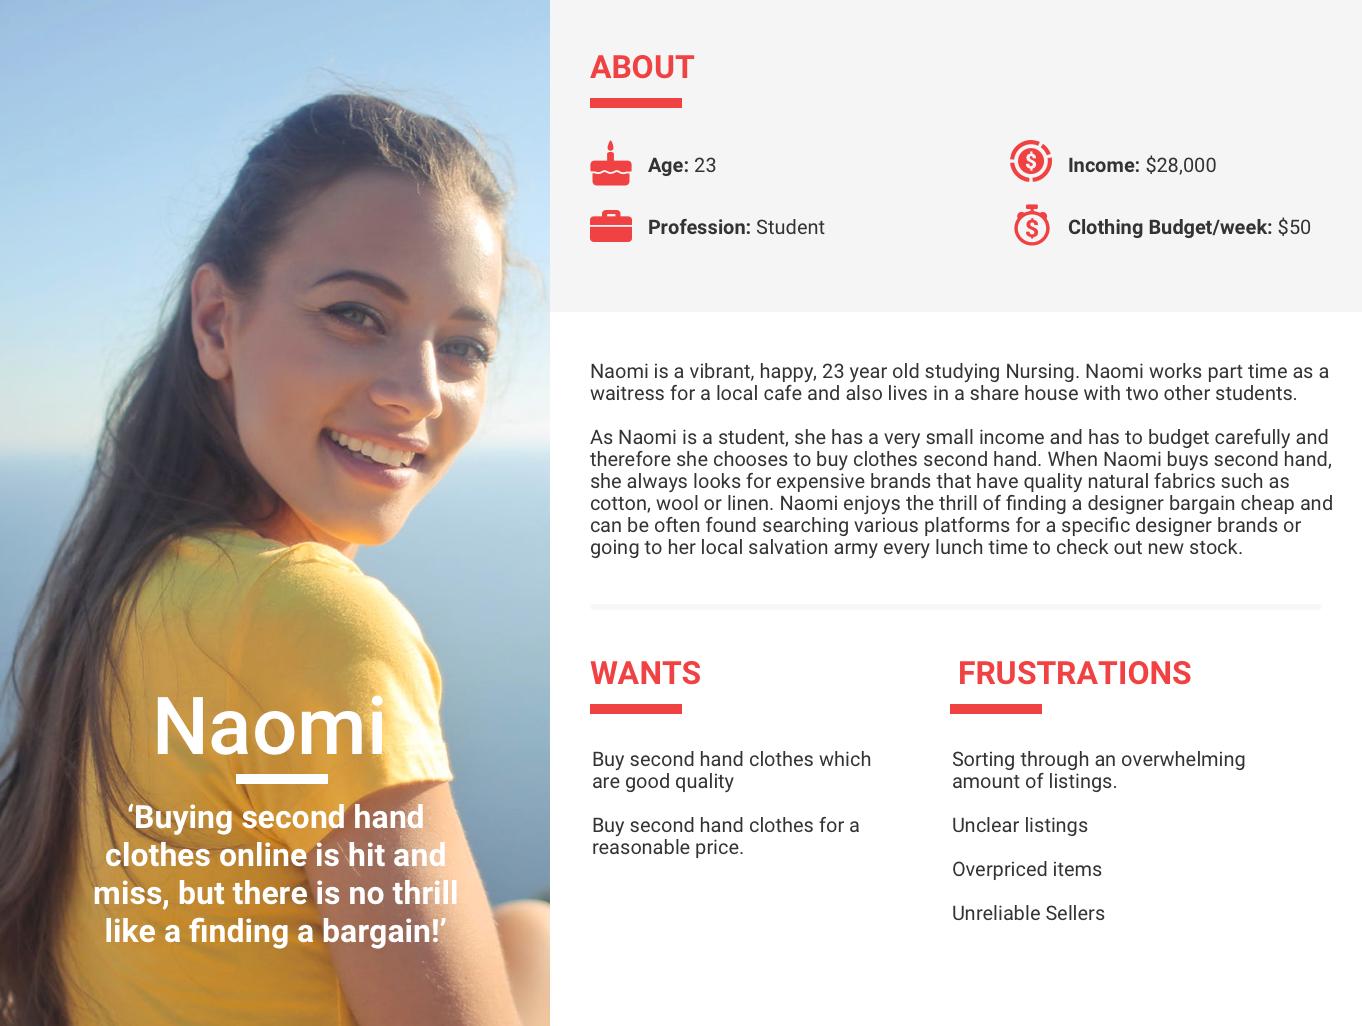 Persona-Naomi.png